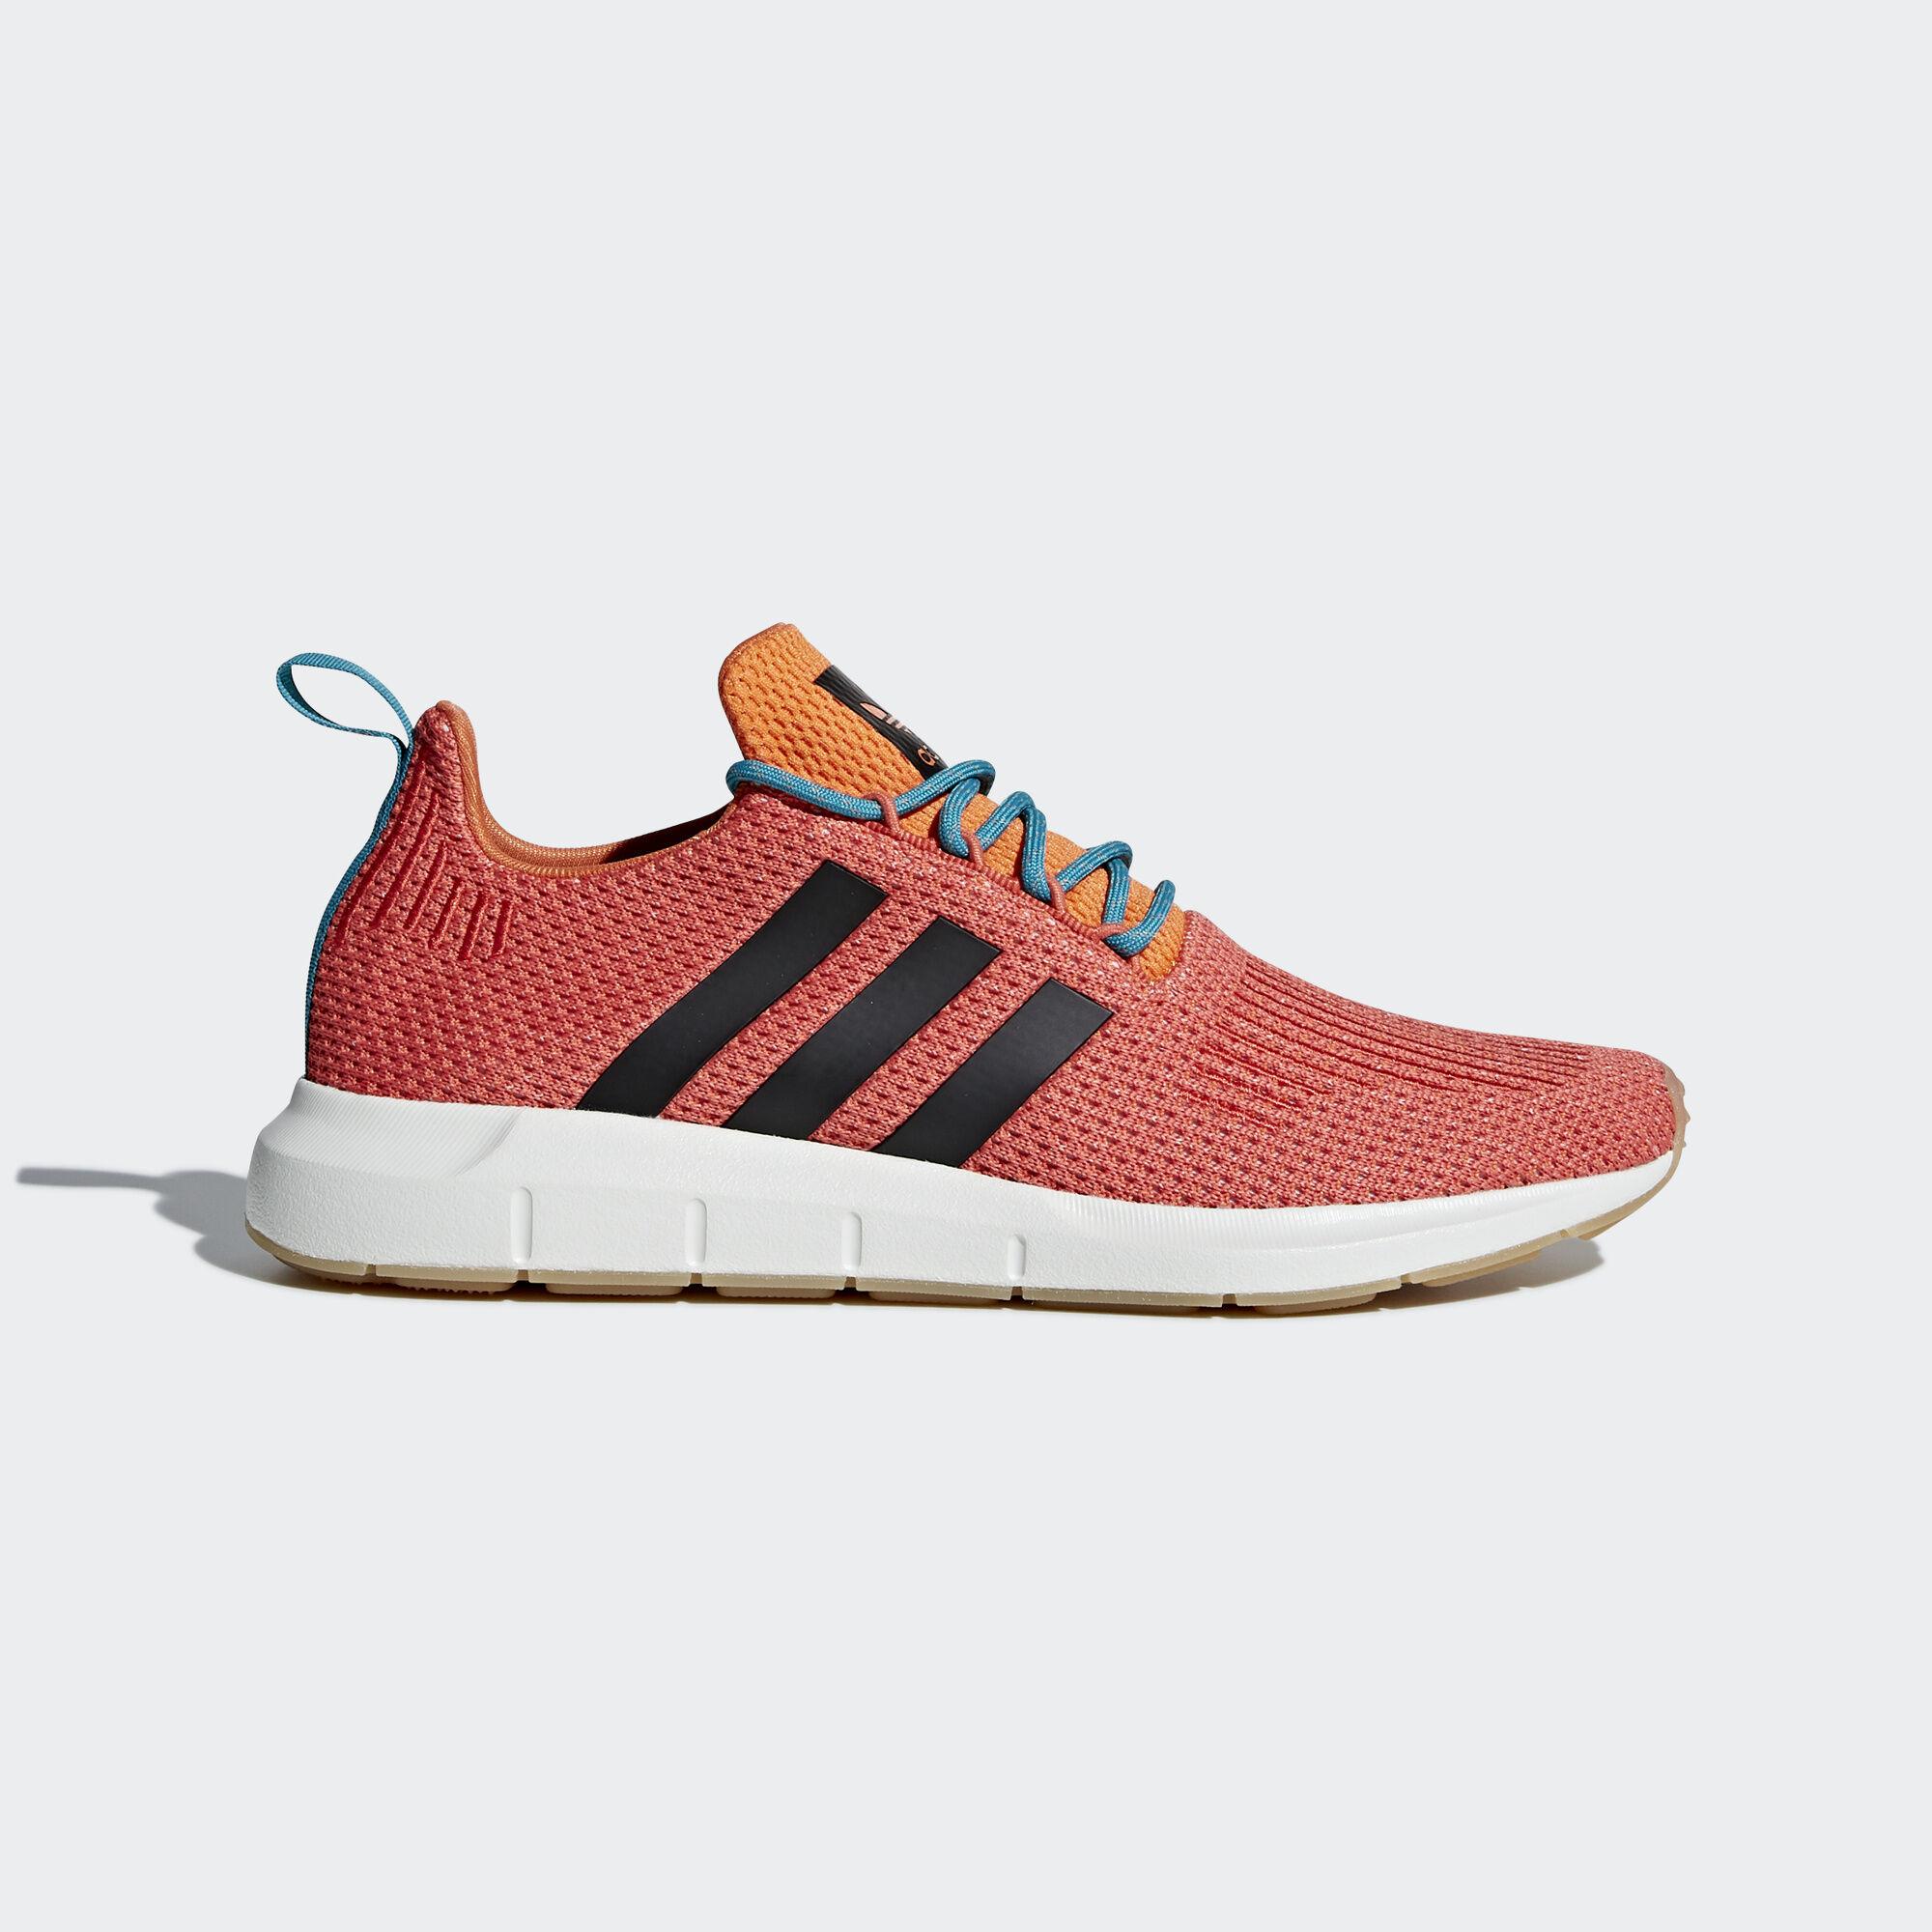 buy online d3d47 0f6ff adidas - Swift Run Summer Shoes Trace OrangeTrace OrangeWhite Tint CQ3086